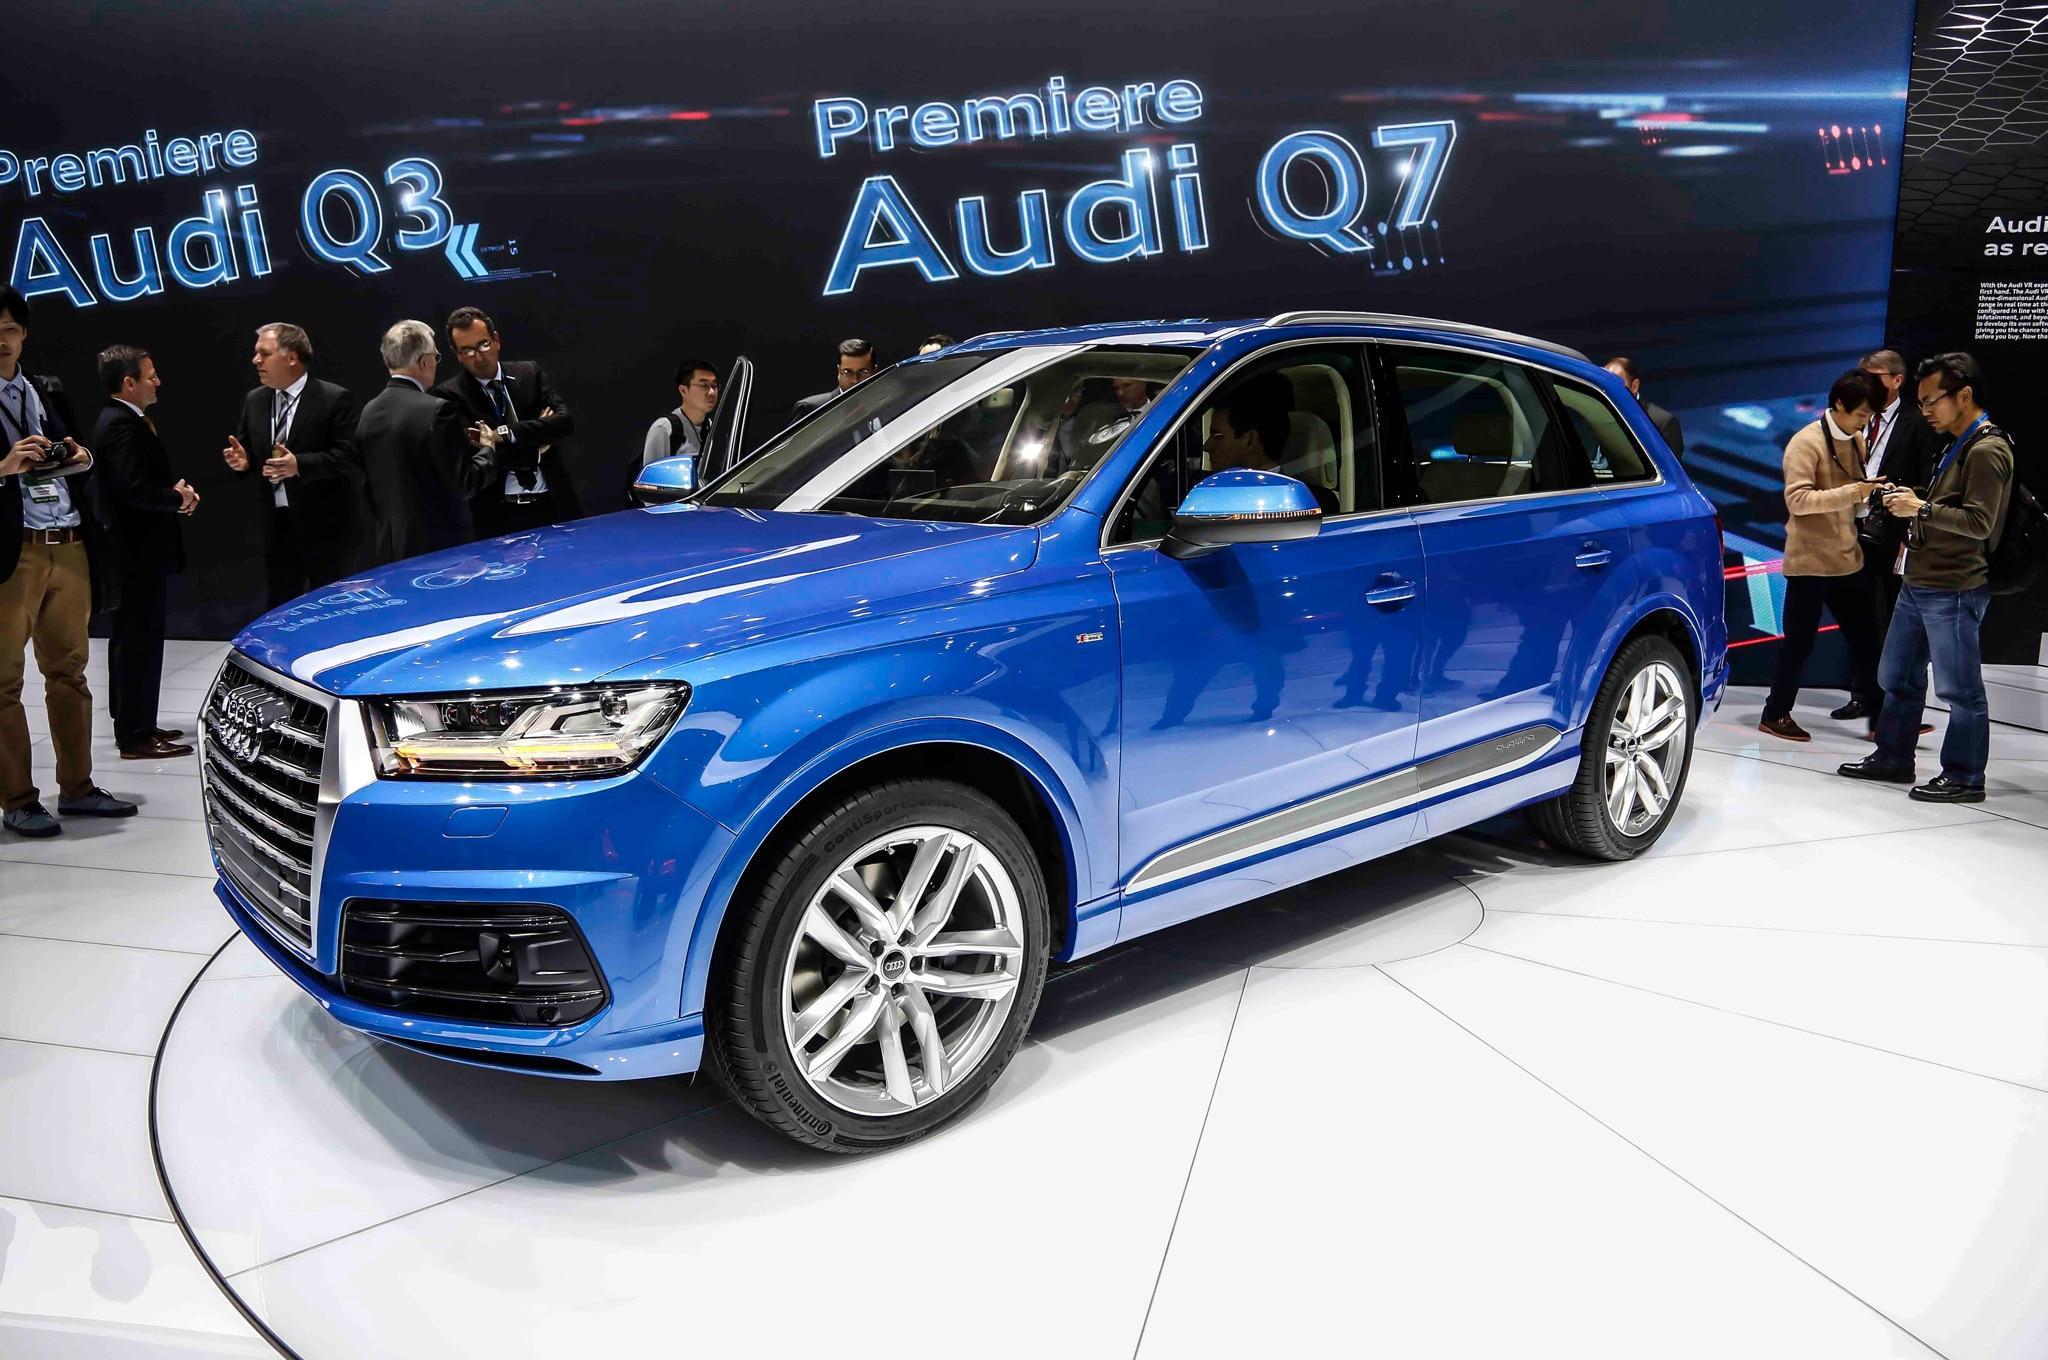 2016 Audi Q7 Coming To Detroit Auto Show